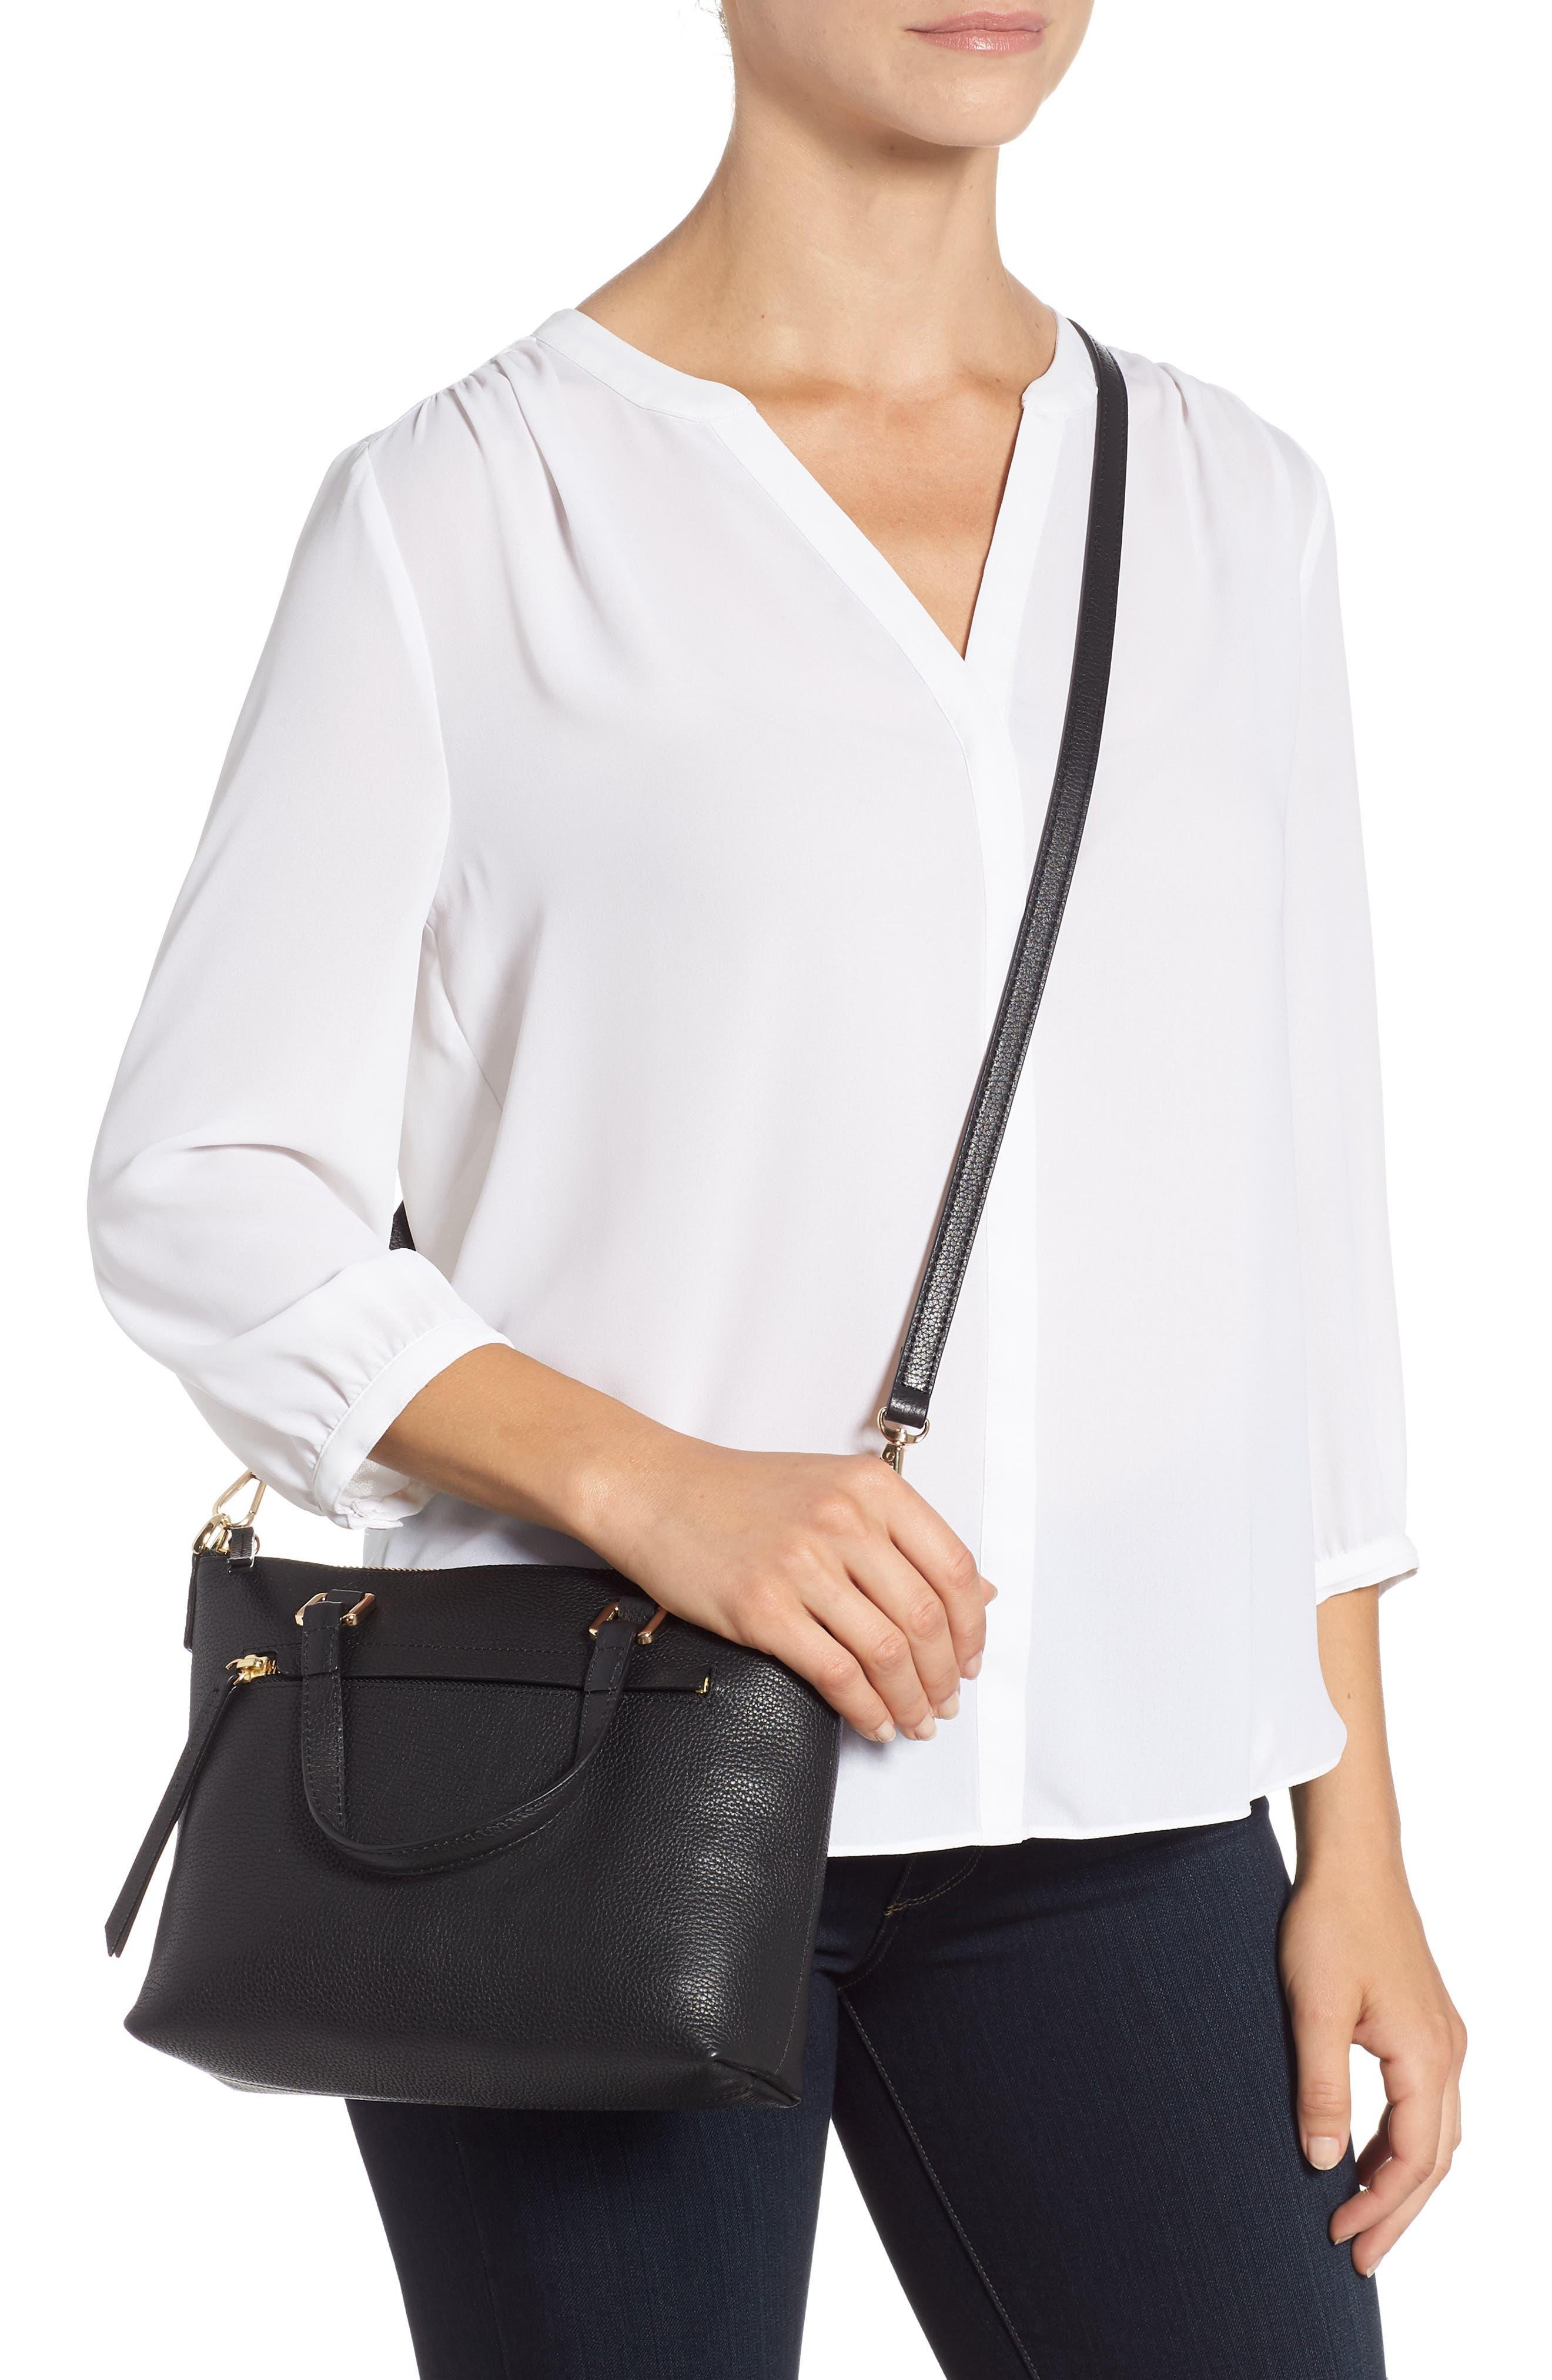 Lexa Leather Crossbody Bag,                             Alternate thumbnail 2, color,                             BLACK